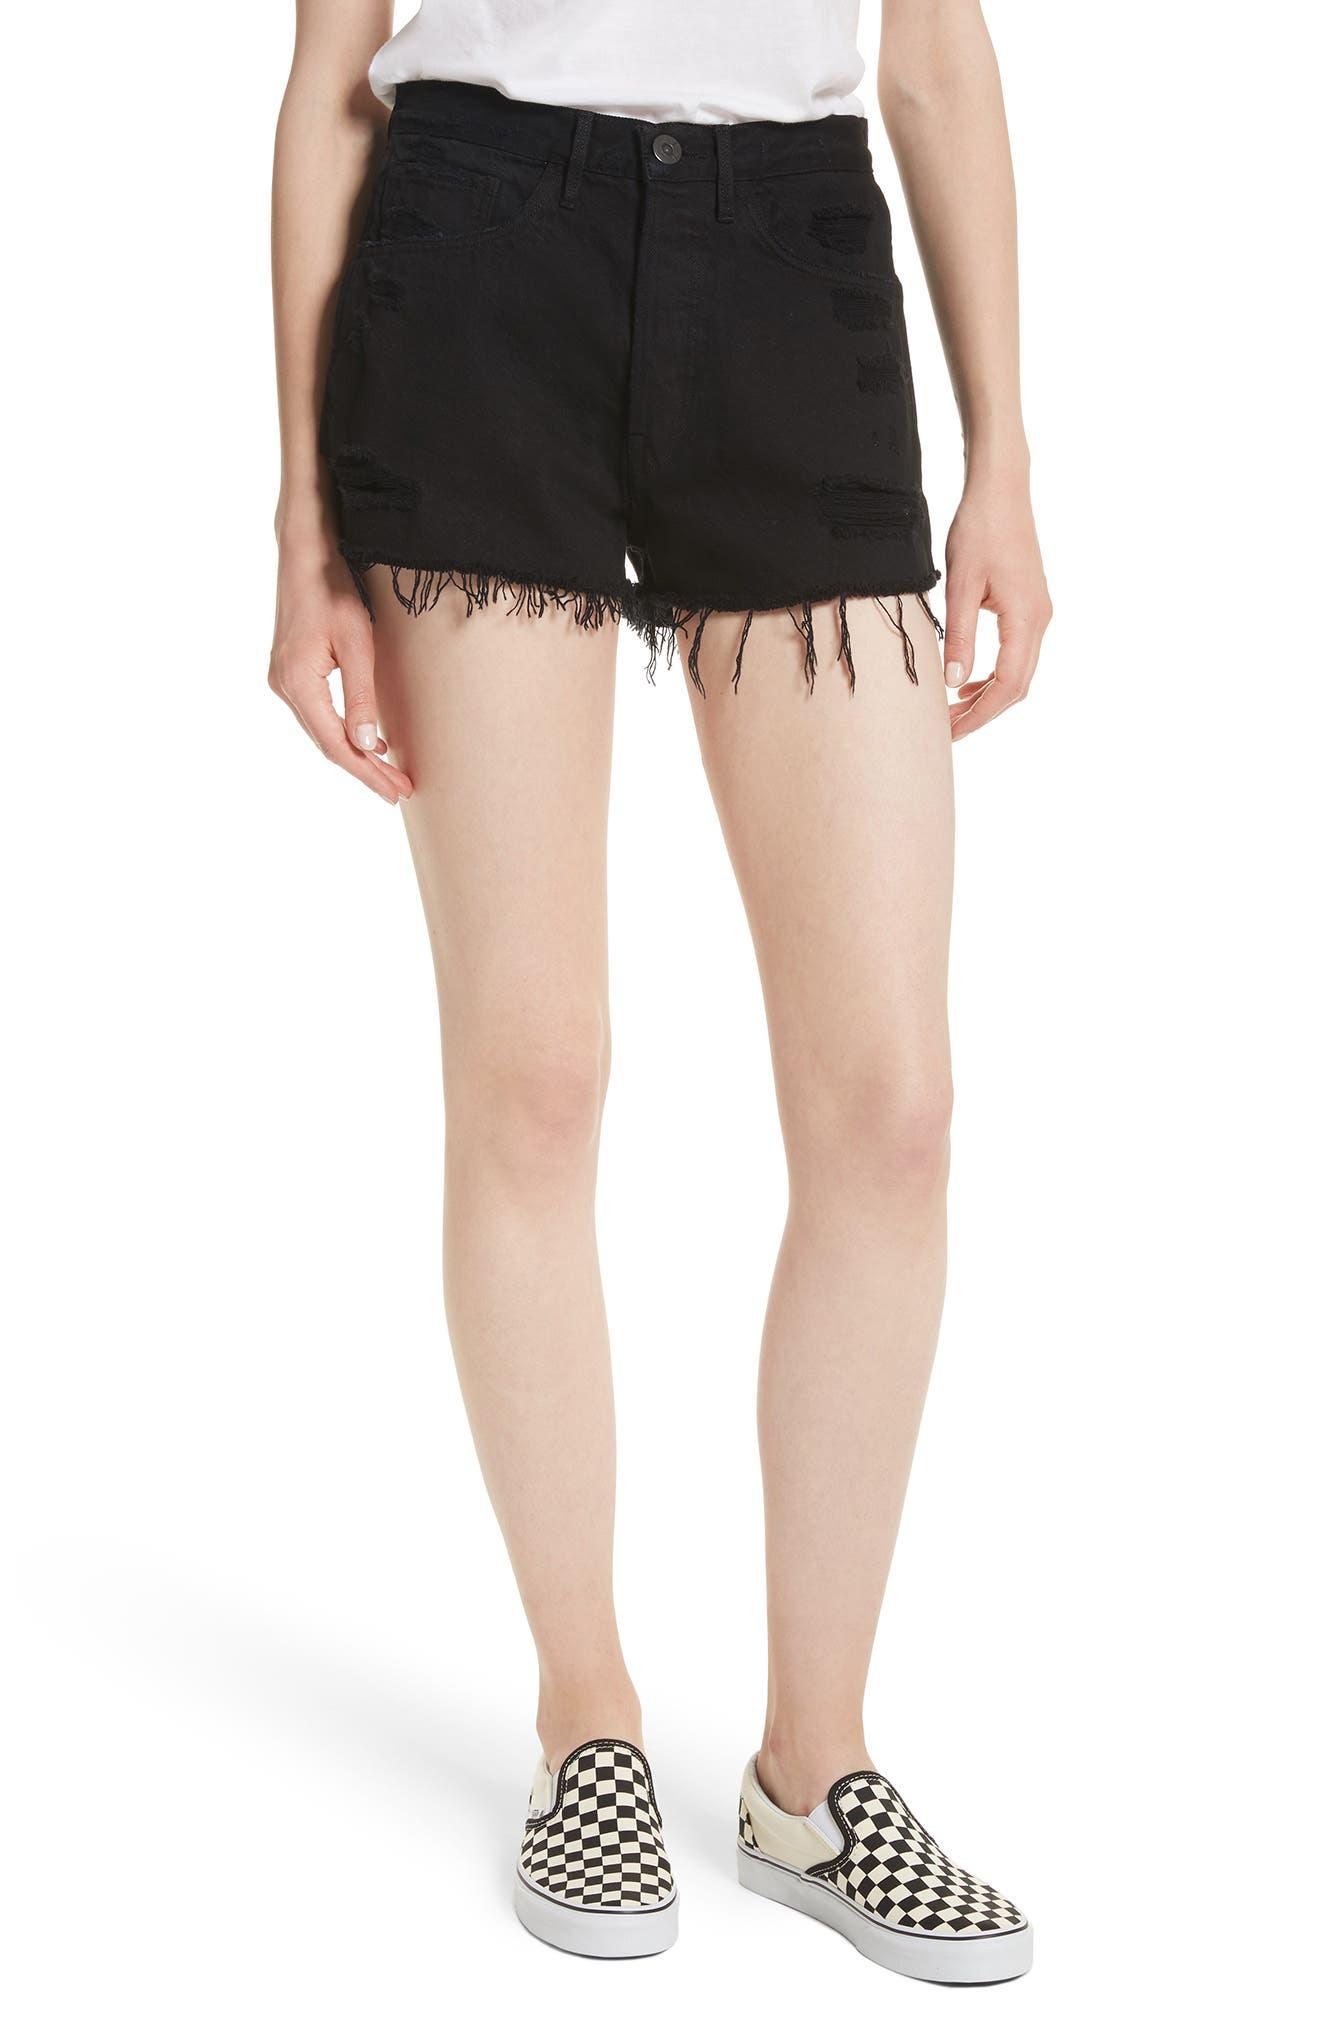 W4 Carter Ripped High Waist Denim Shorts,                             Main thumbnail 1, color,                             Carbon